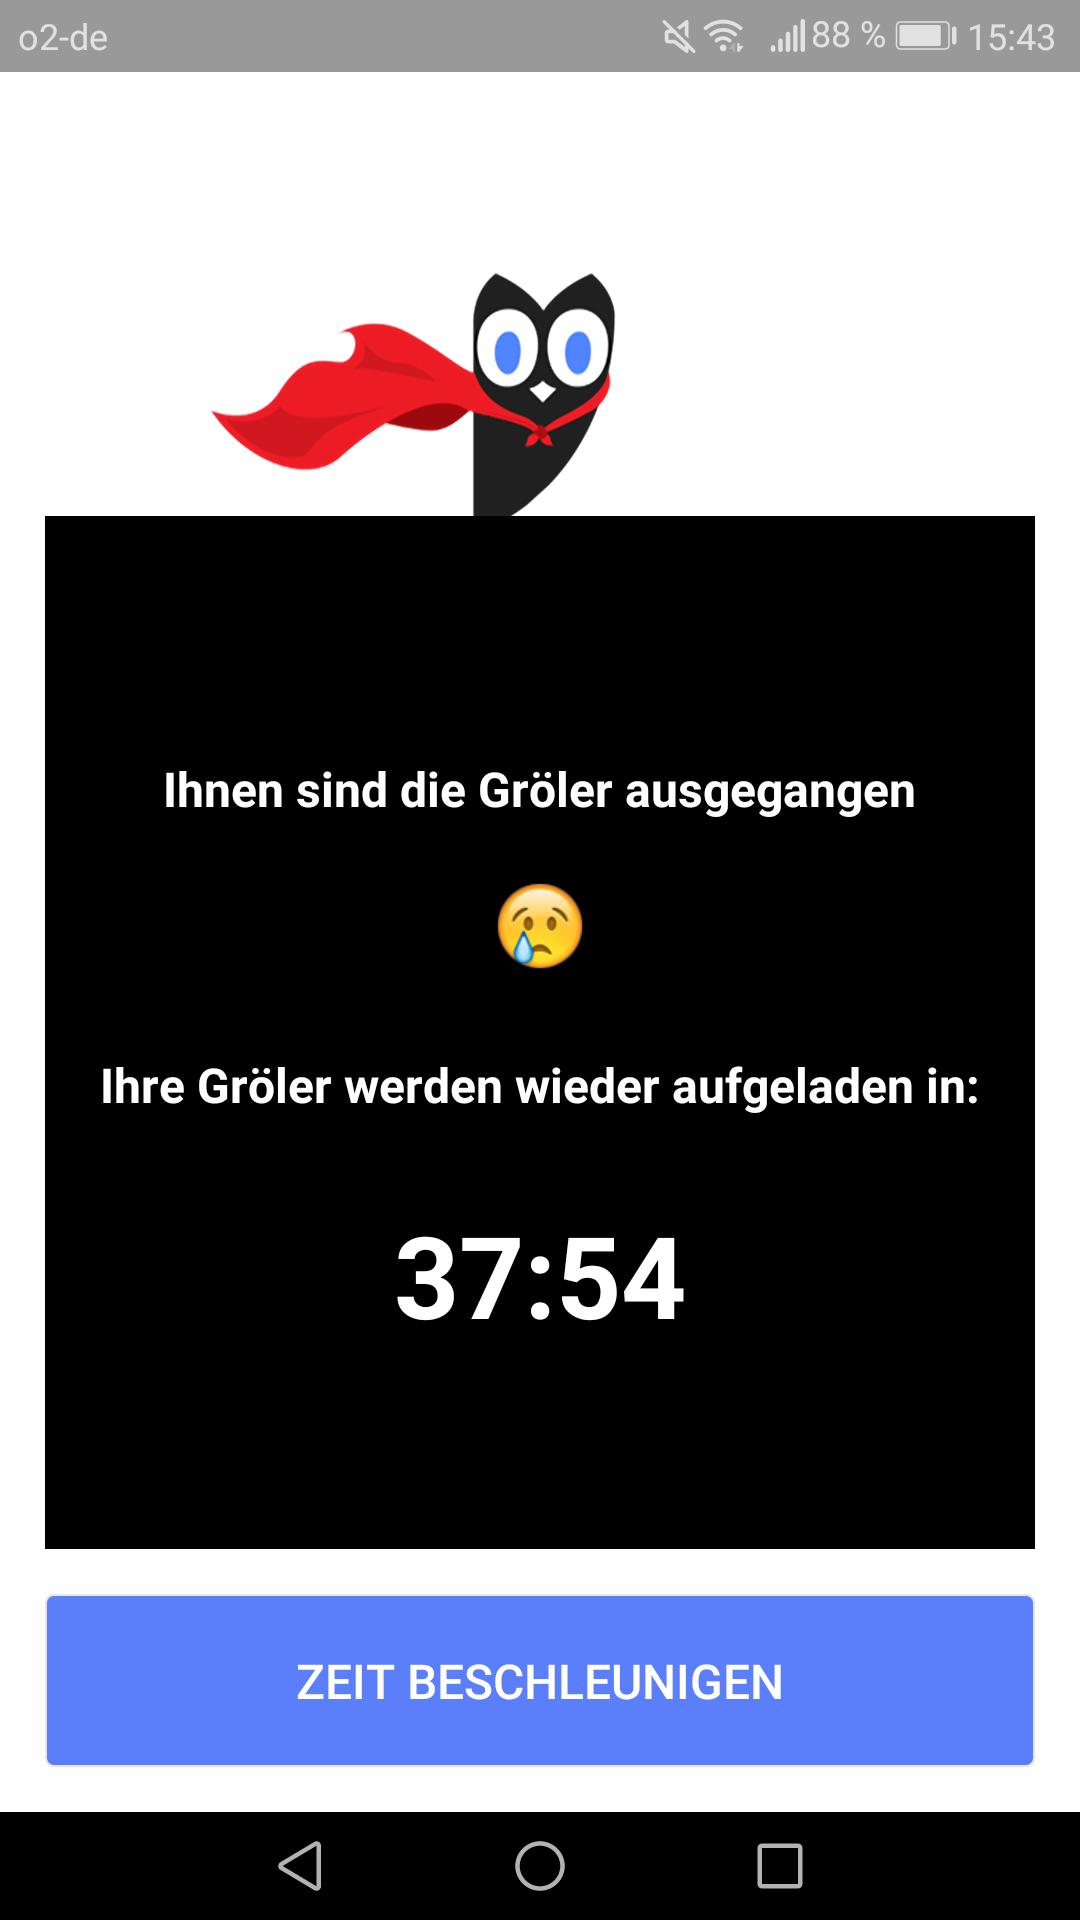 Screenshot_Hooked_Groeler_aufgebraucht_2 (1.9.2017)